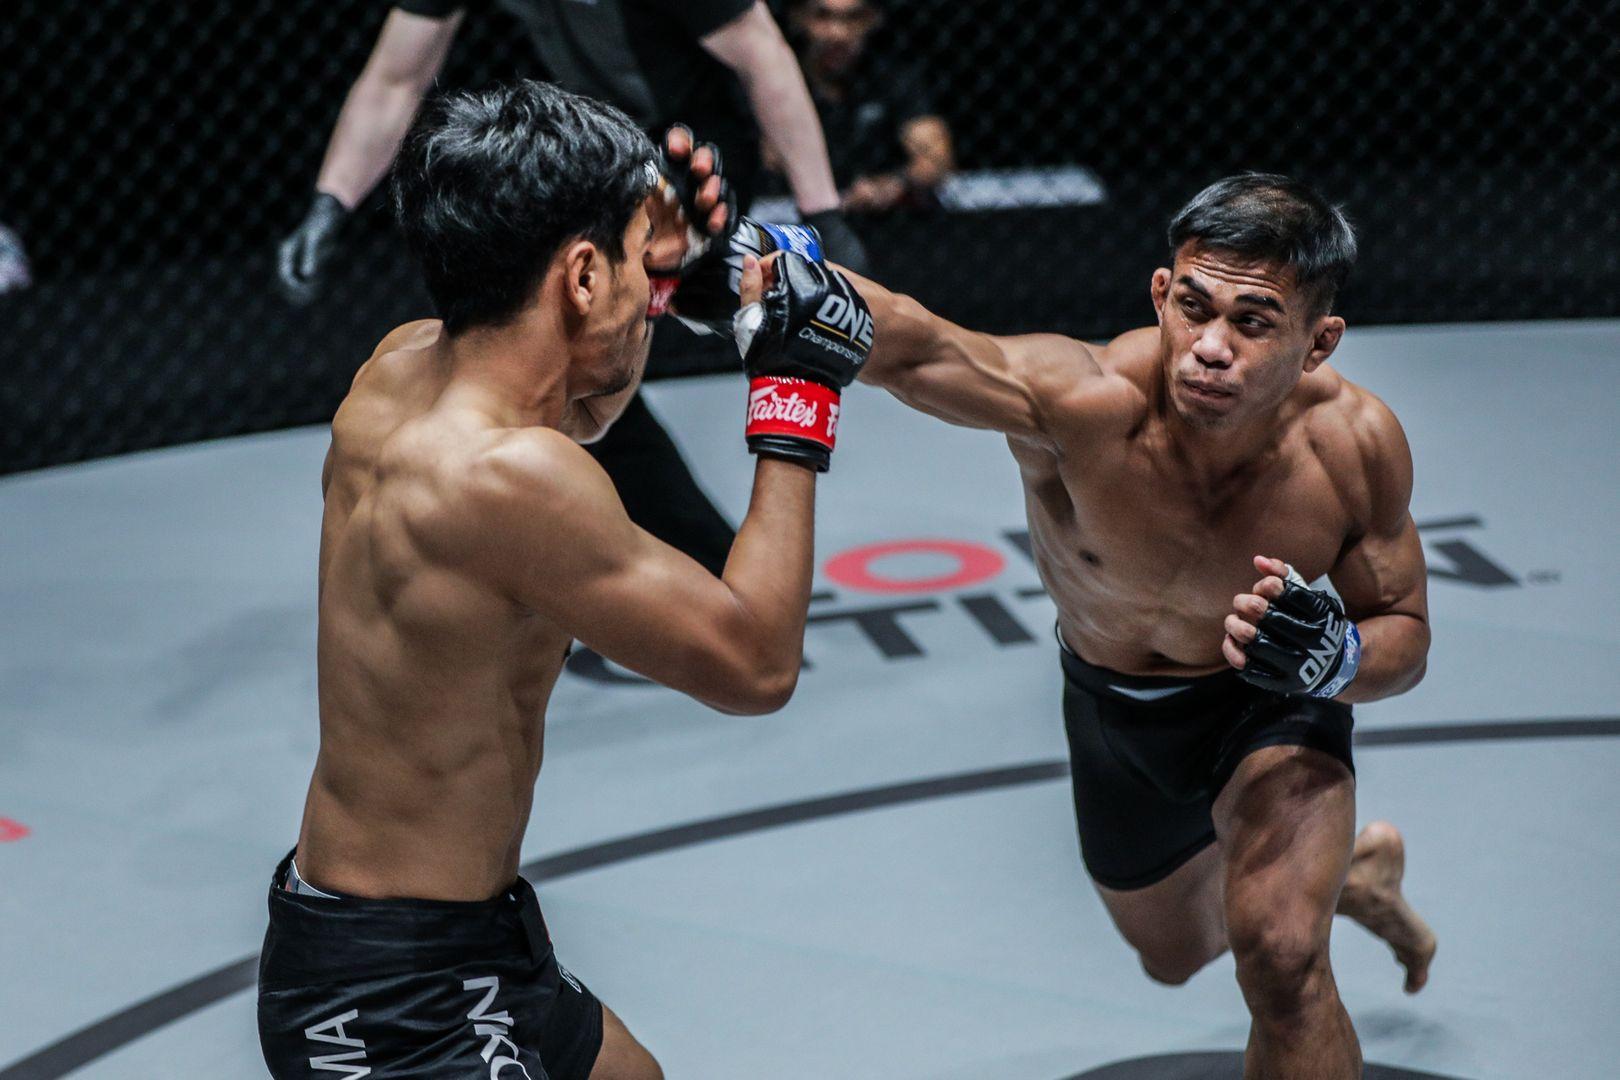 Indonesian MMA fighter Eko Roni Saputra throws a right cross